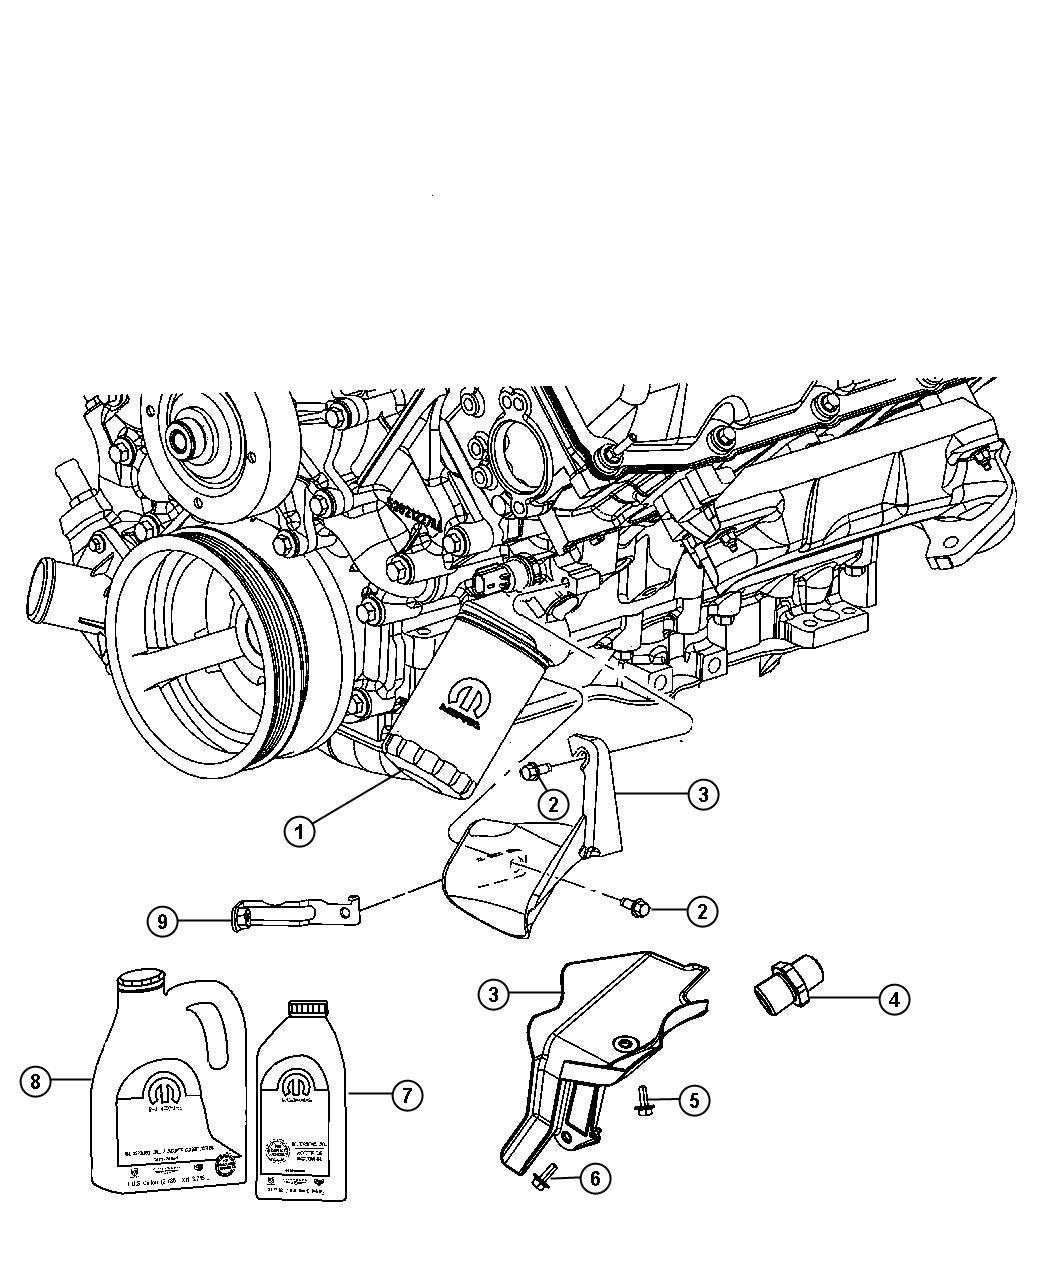 Jeep Grand Cherokee Filter. Engine oil. Magneti marelli